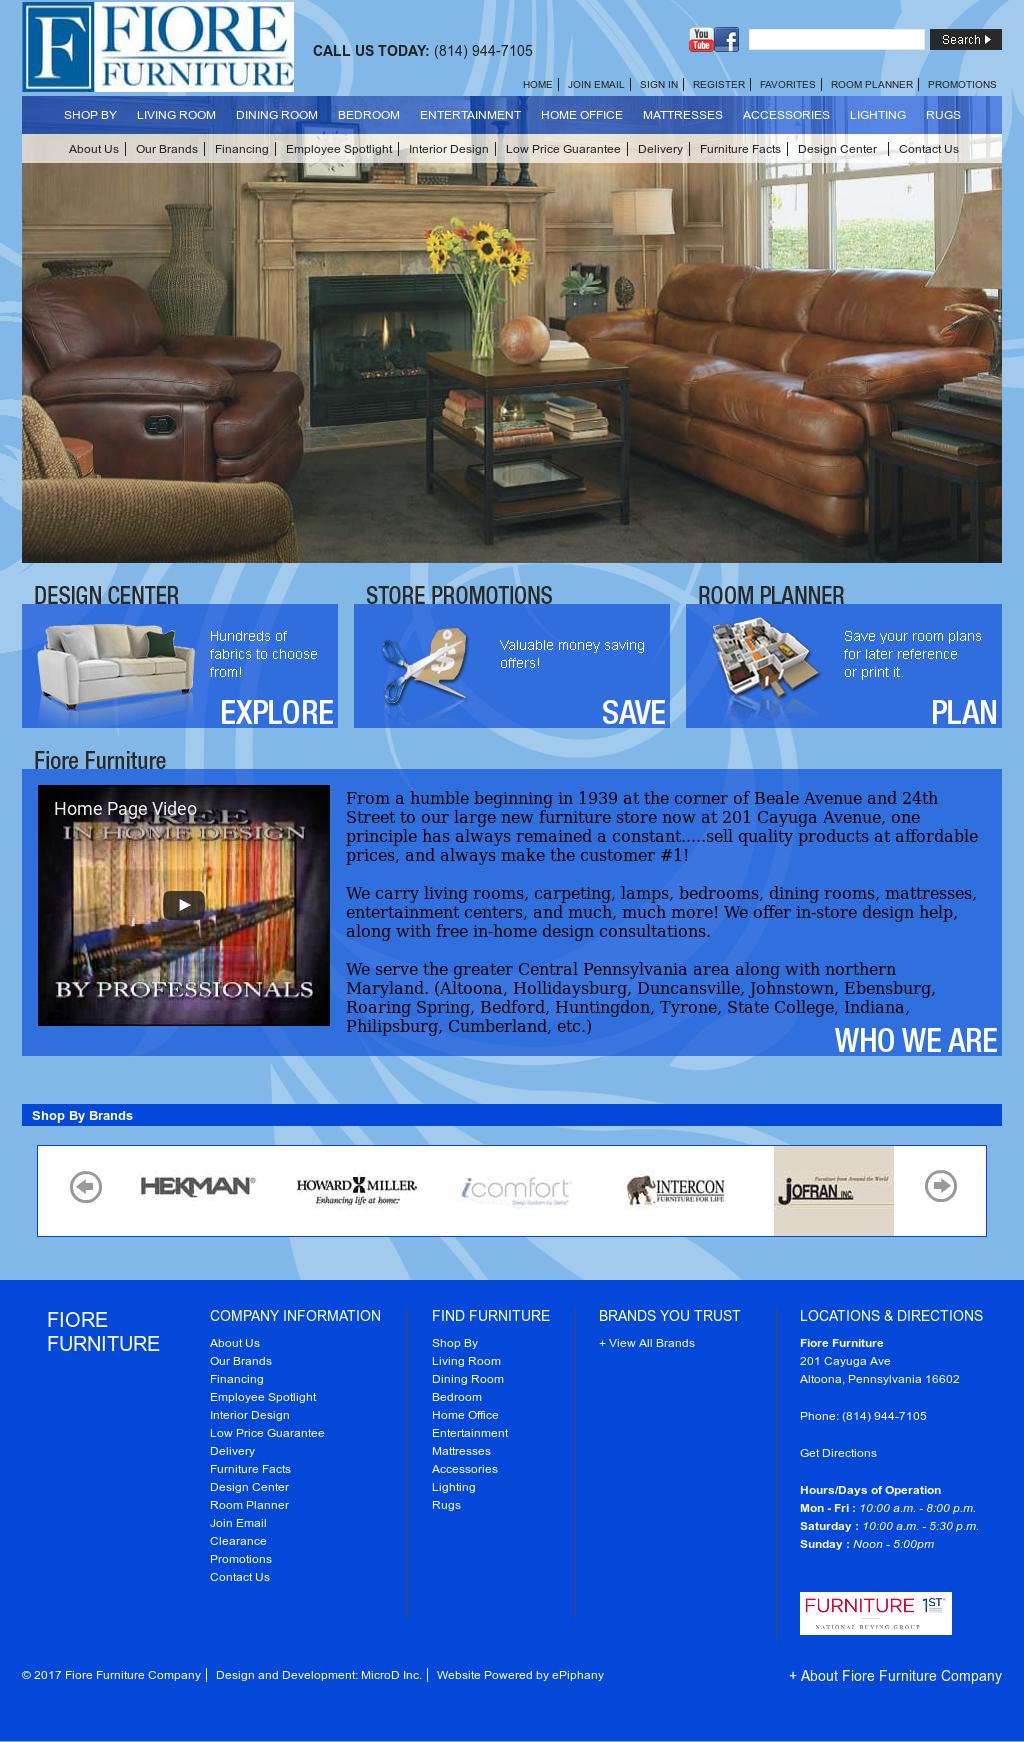 Fiore Furniture Company Competitors, Revenue and Employees ...